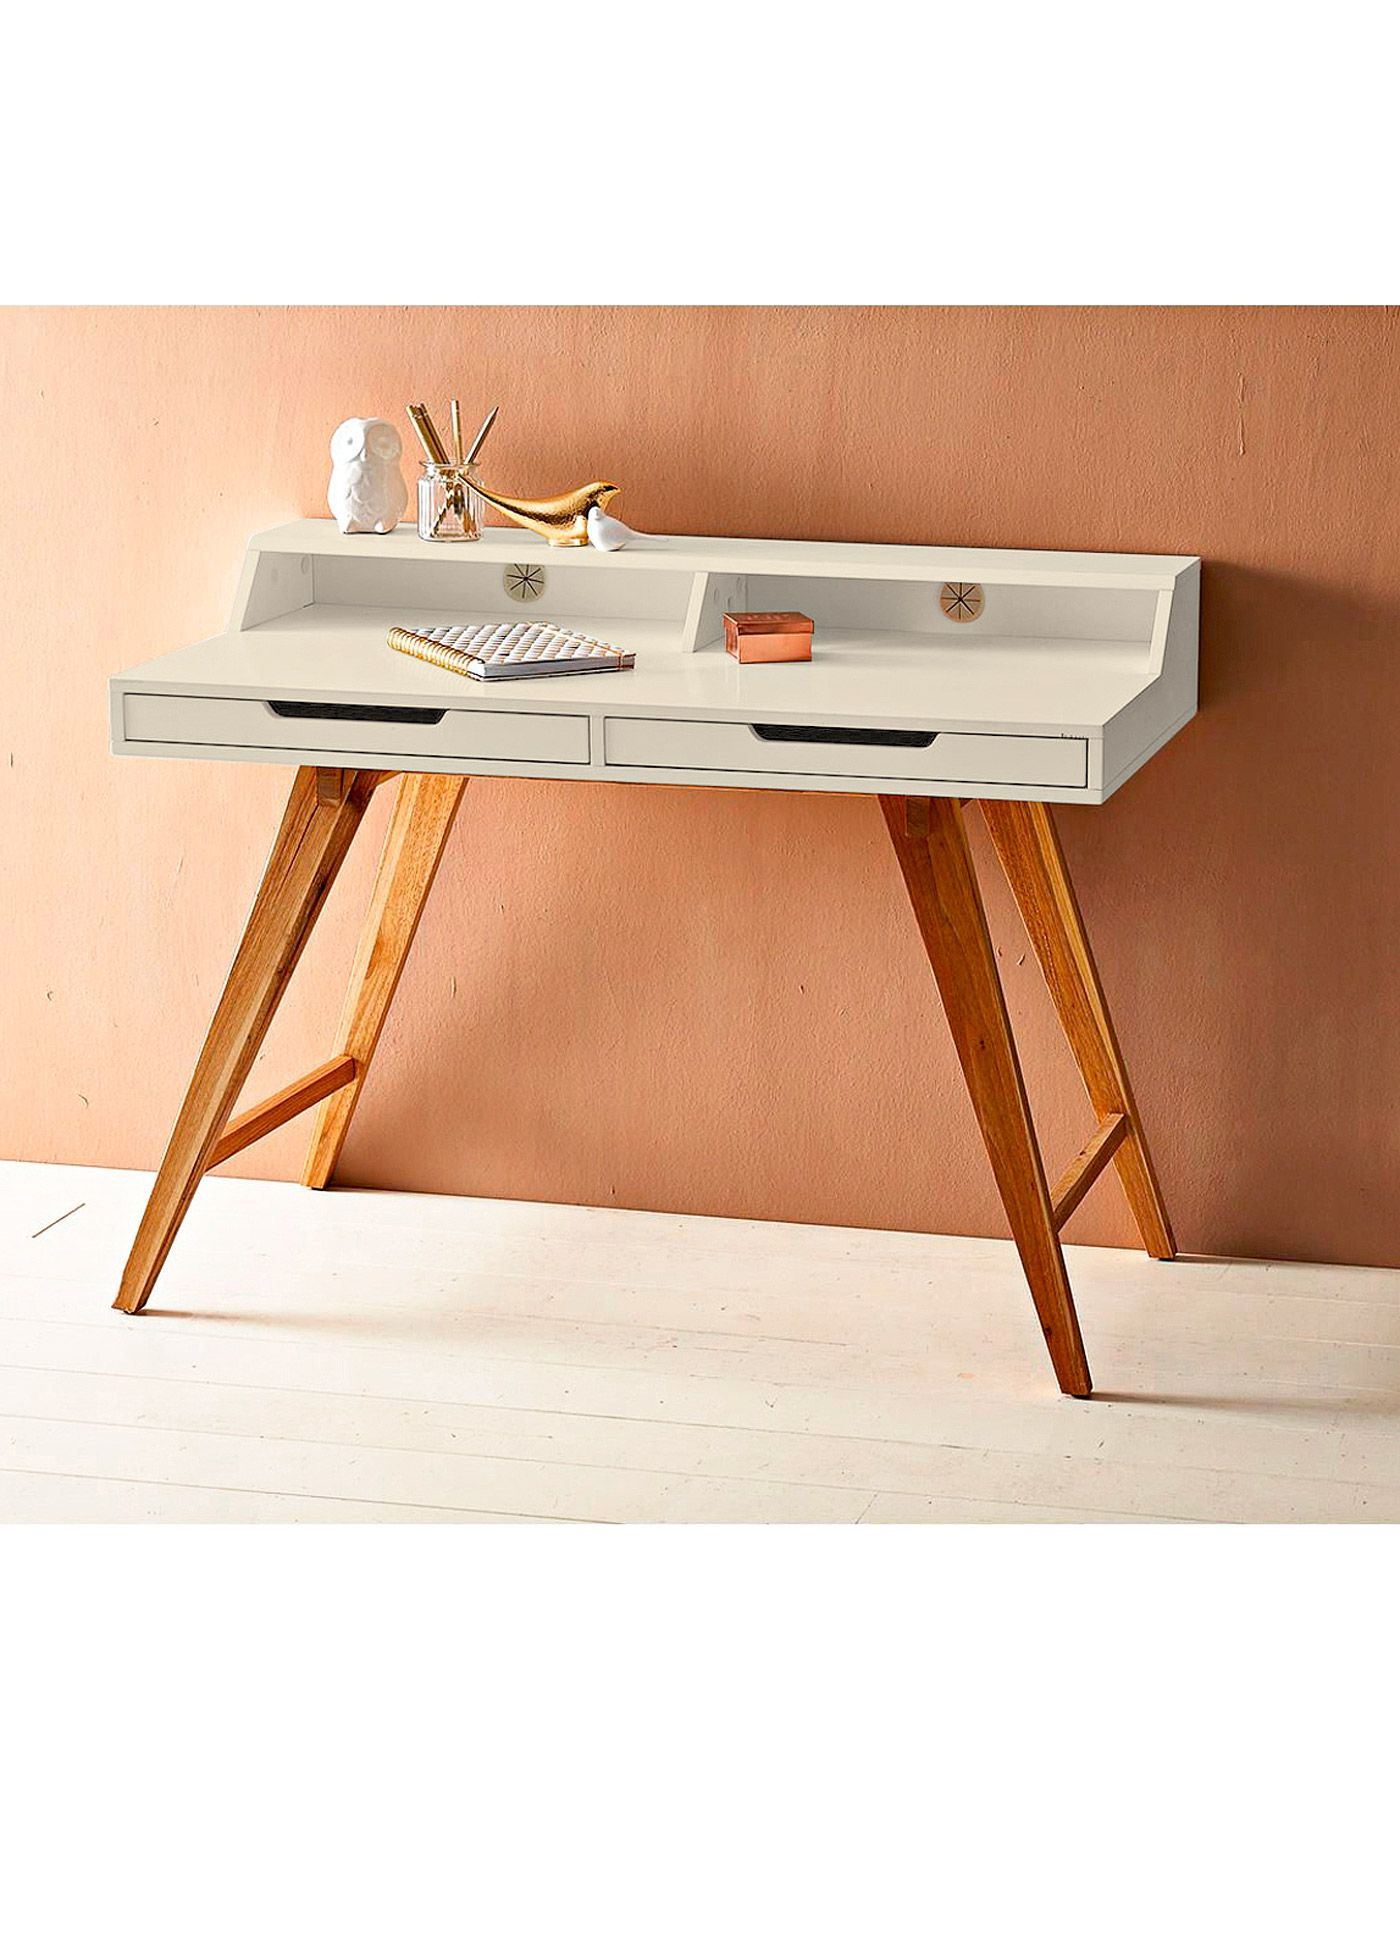 sekret r natur weiss home collection online kaufen. Black Bedroom Furniture Sets. Home Design Ideas